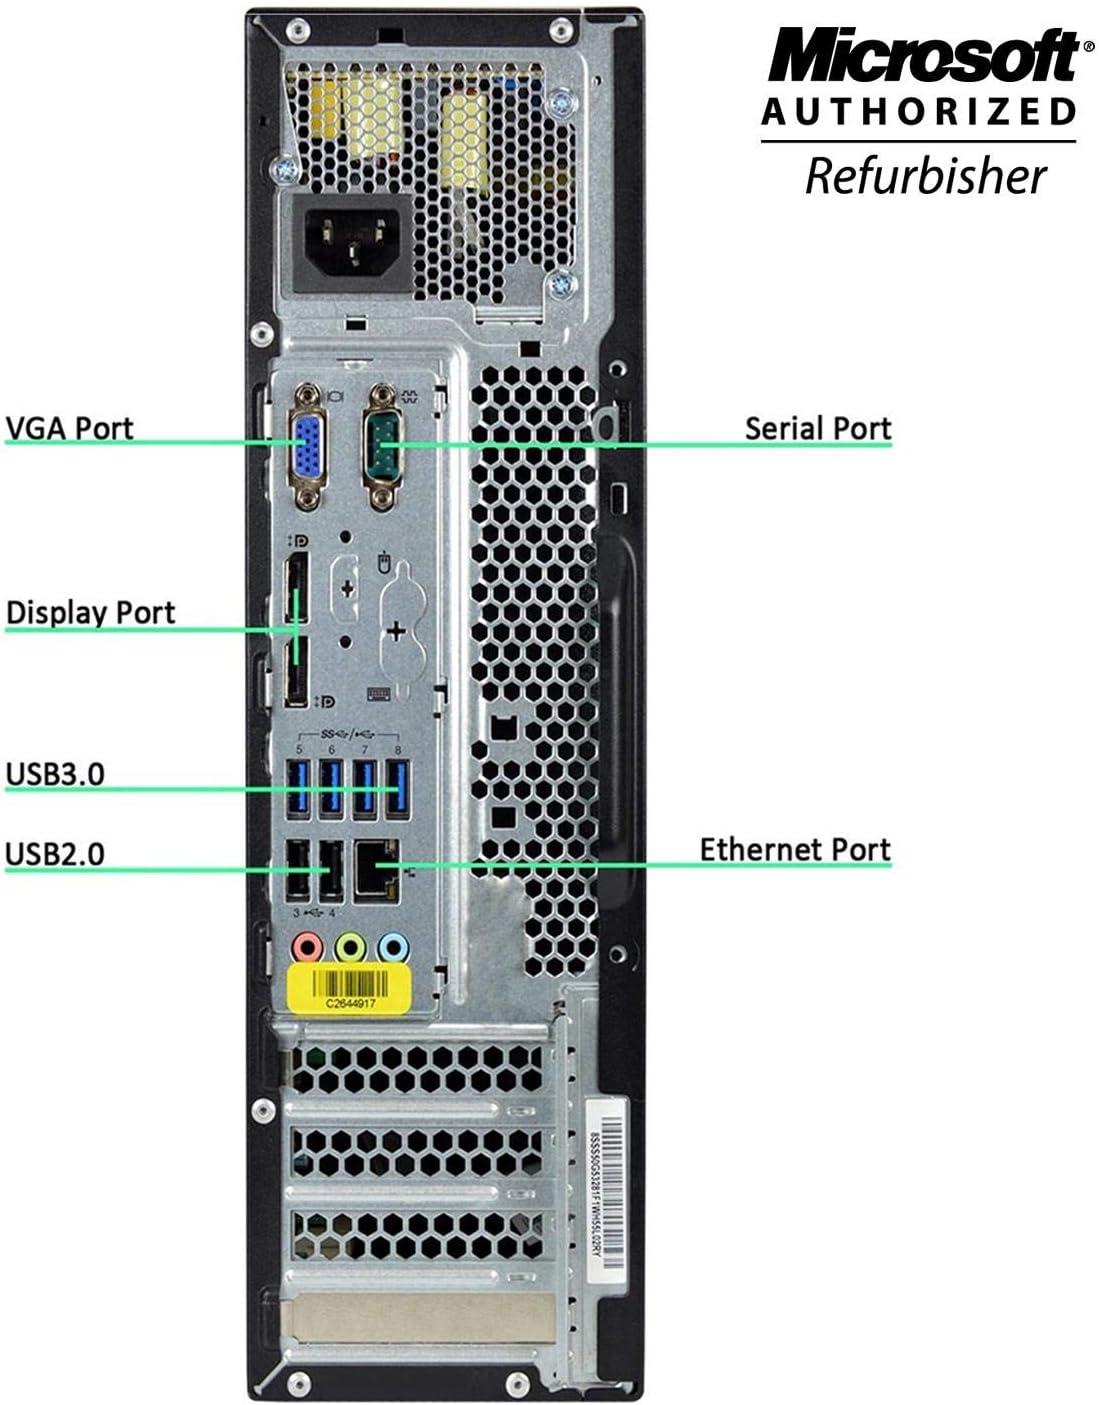 256GB SSD NEW NVIDIA GT 1030 2GB DDR5 16GB DDR3 RAM Windows 10 Home 64-bit DVD-ROM Lenovo M93P Small Form Factor High Performance Gaming Desktop Computer PC Renewed Intel Core I7-4770 3.4Ghz